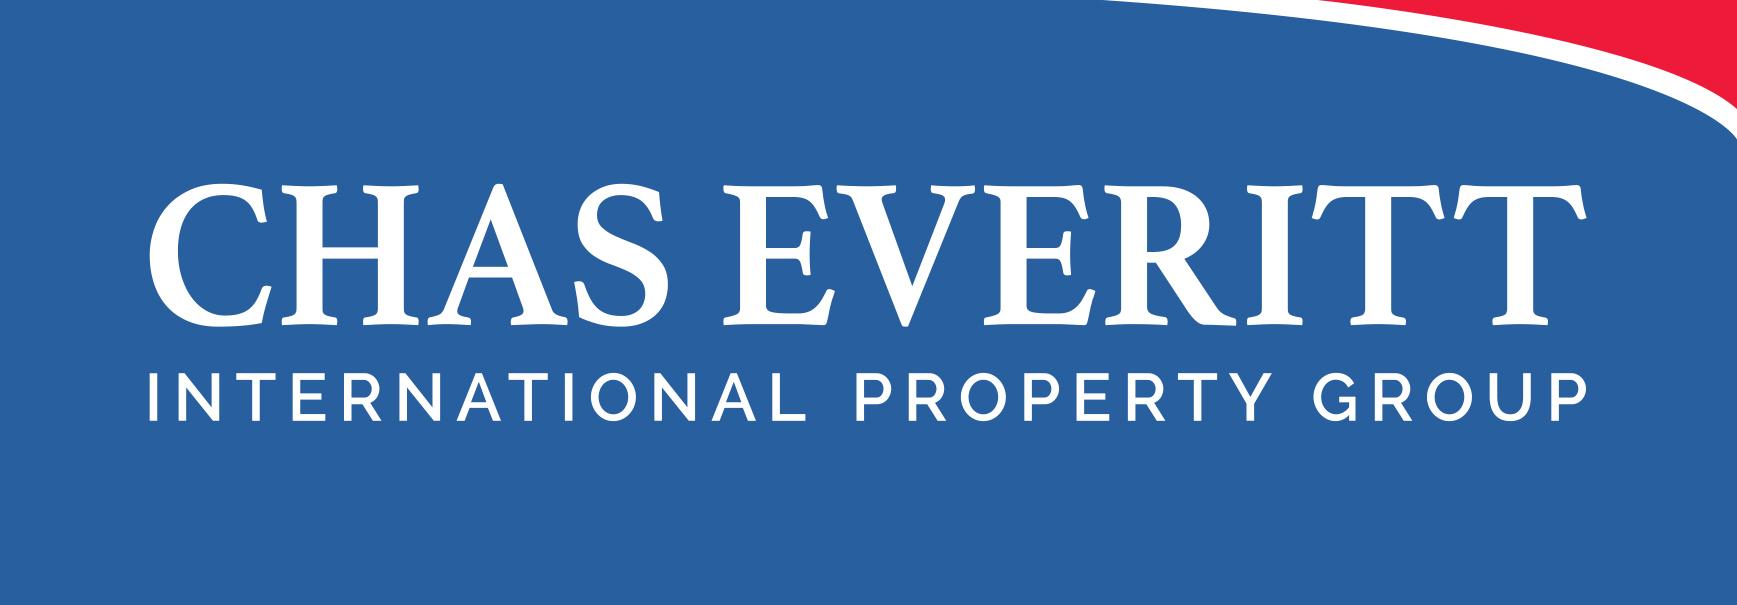 Chas Everitt Property Group